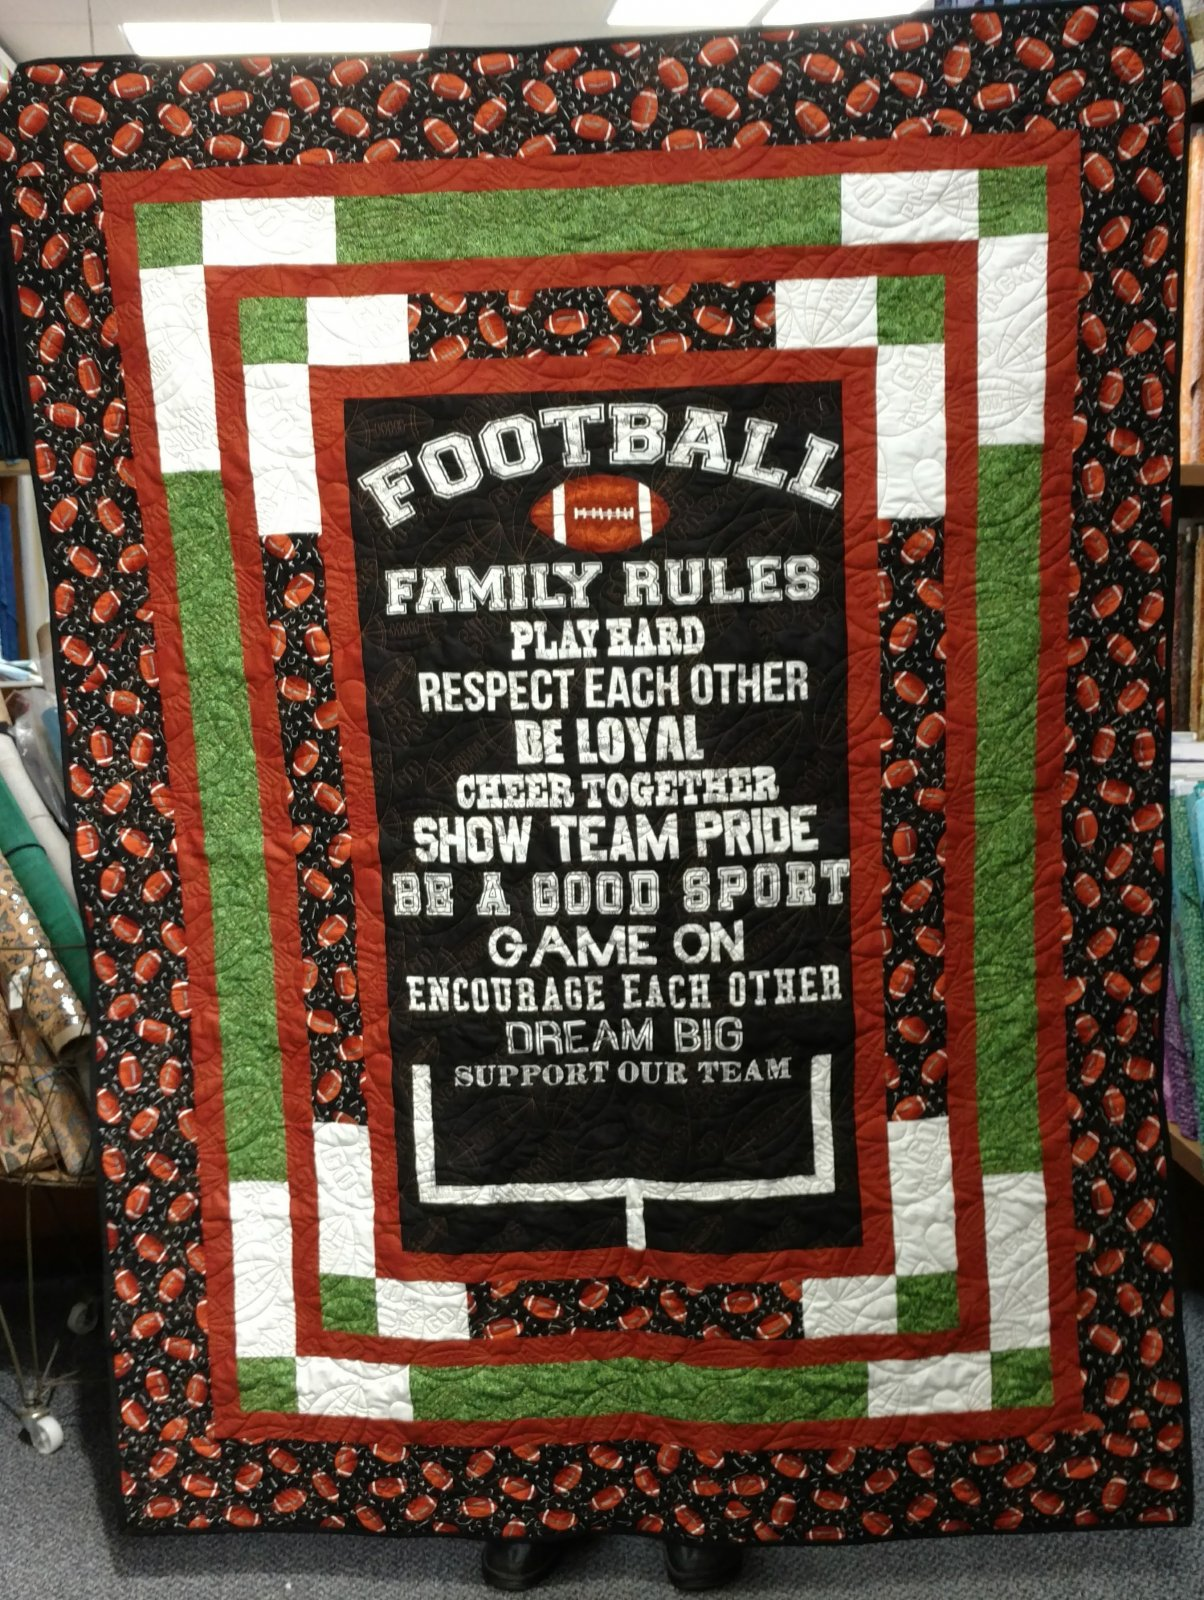 Football Family Rules